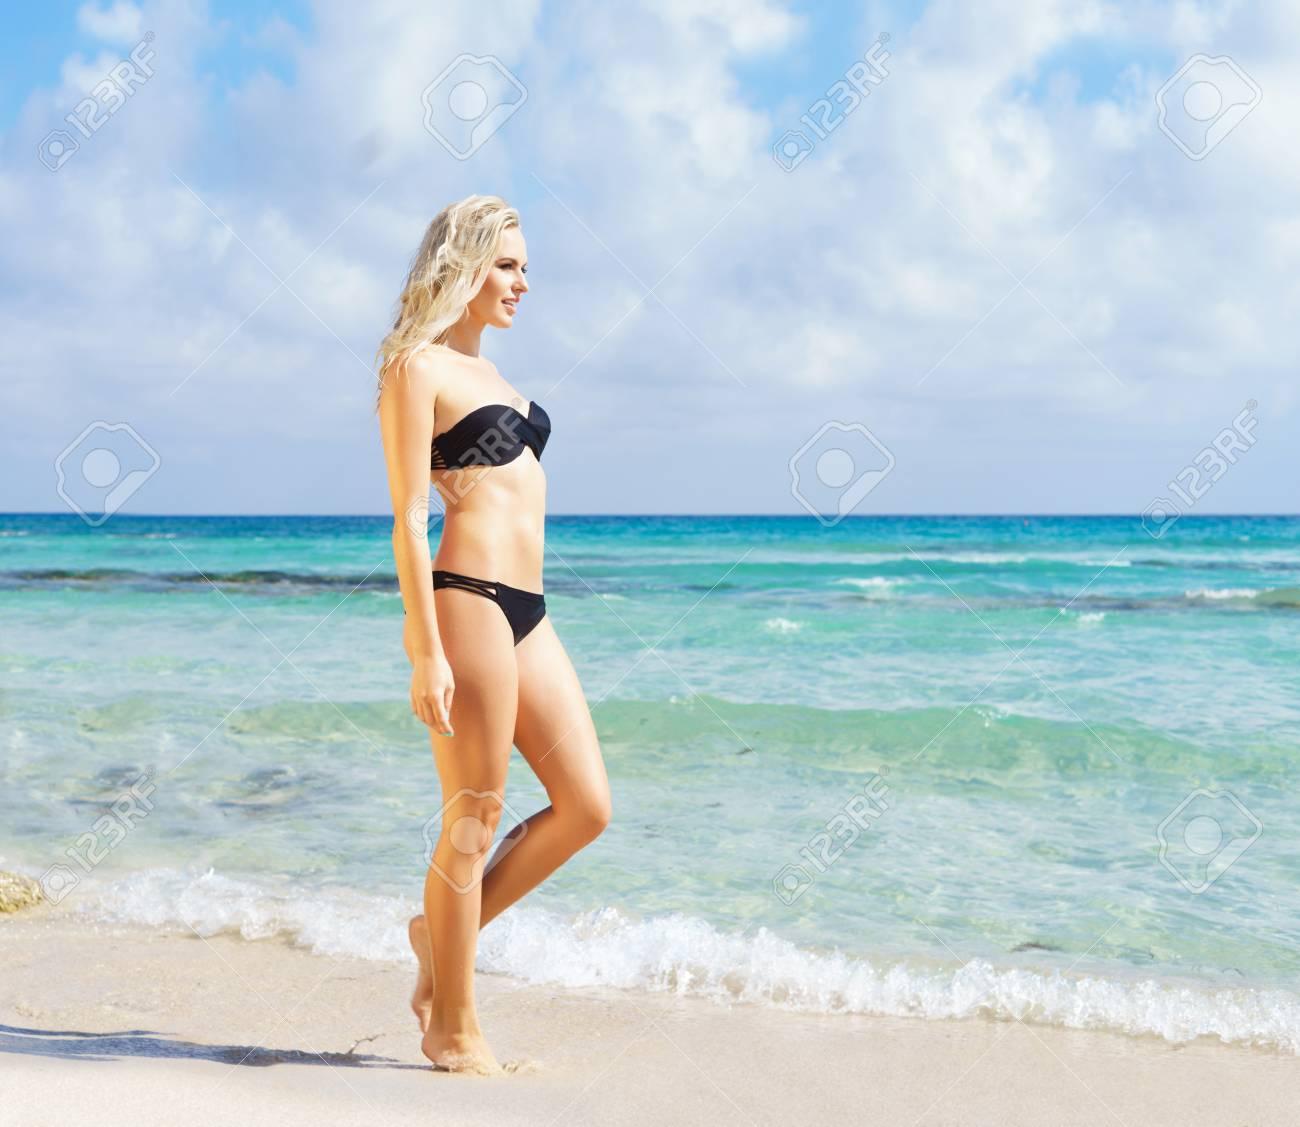 e70fa836b1 Beautiful woman in black bikini. Young and sporty girl posing on a beach at  summer